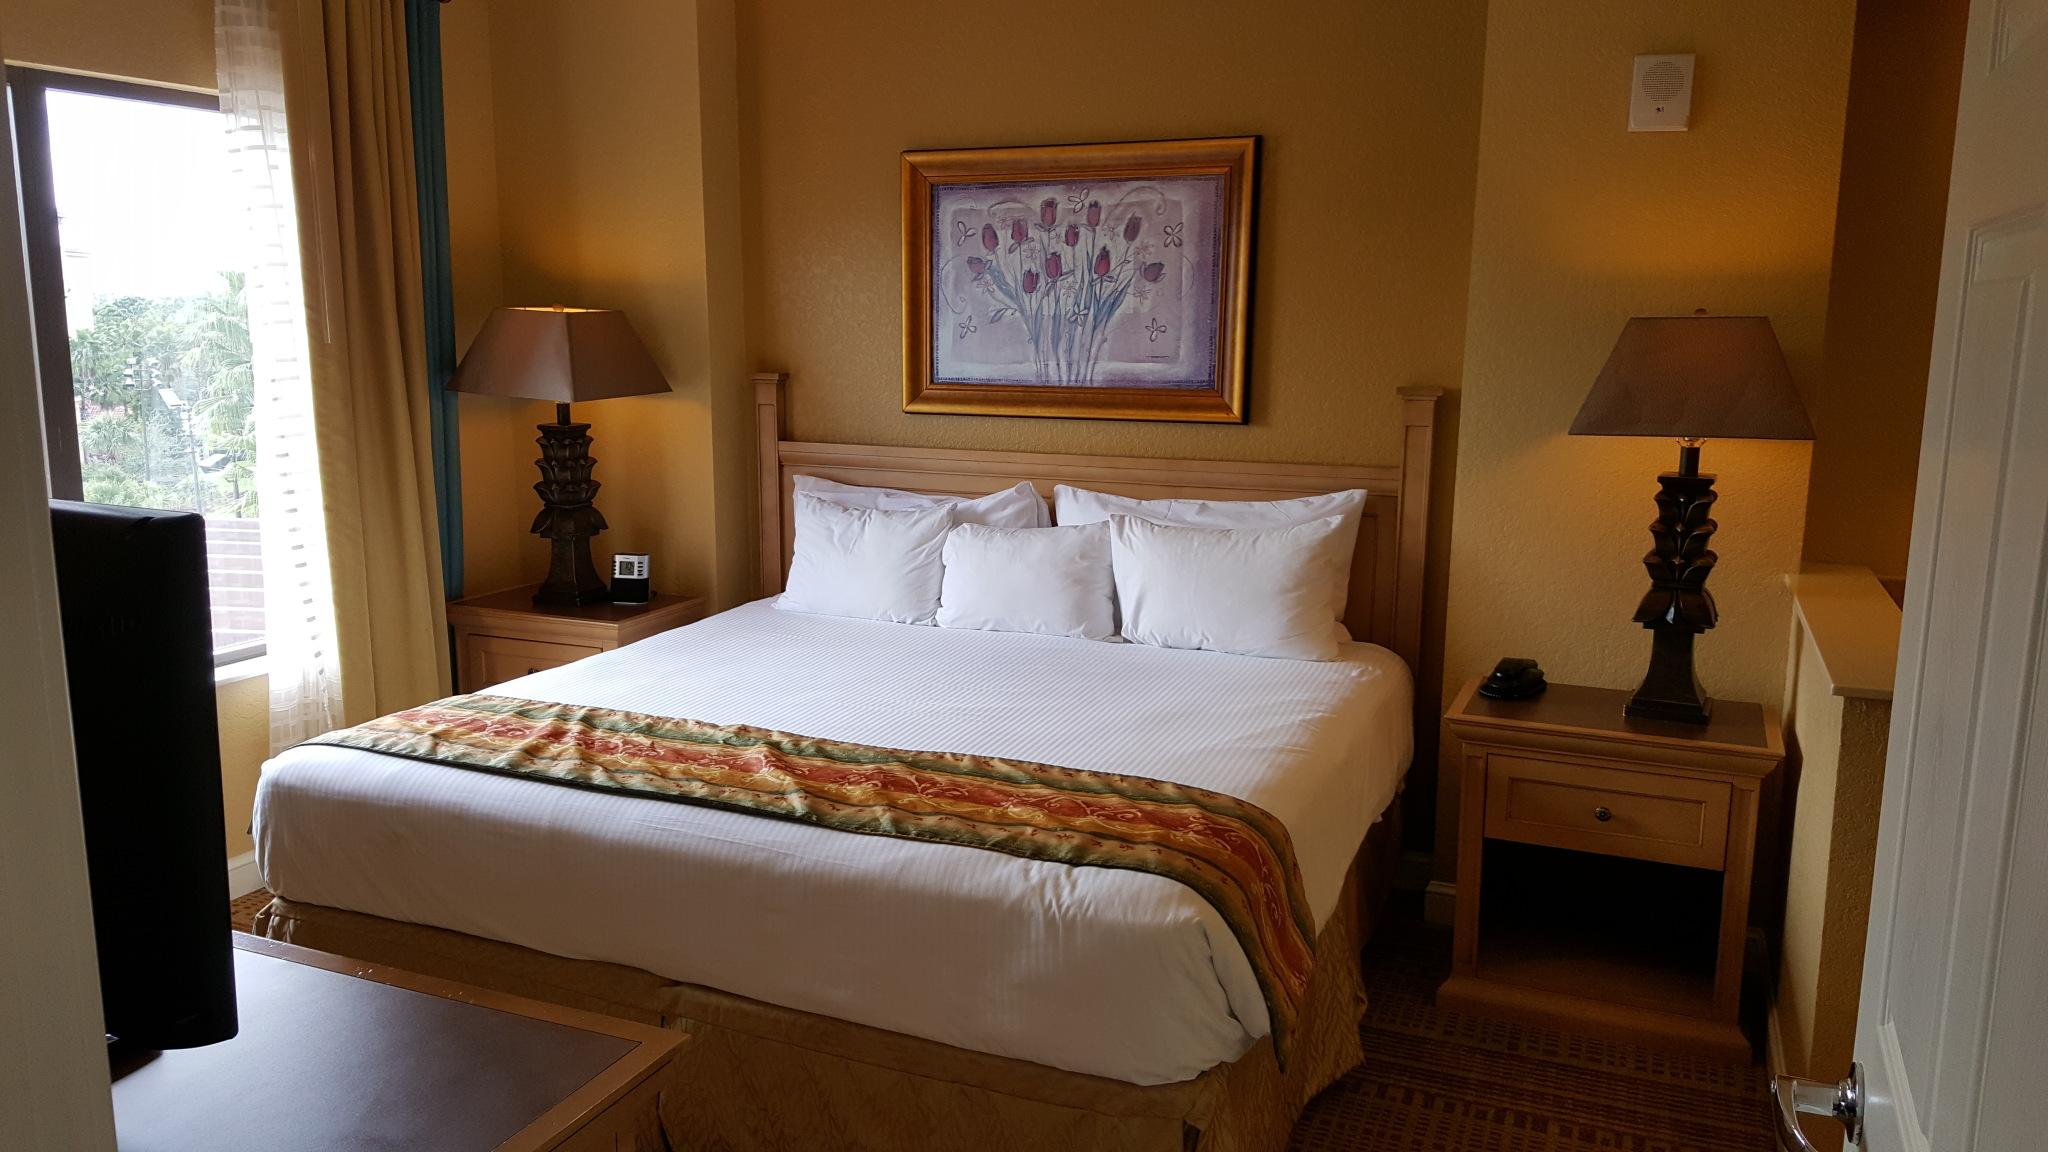 Apartment Bonnet Creek Orlando 3 Bedroom 2 Bath photo 16825335